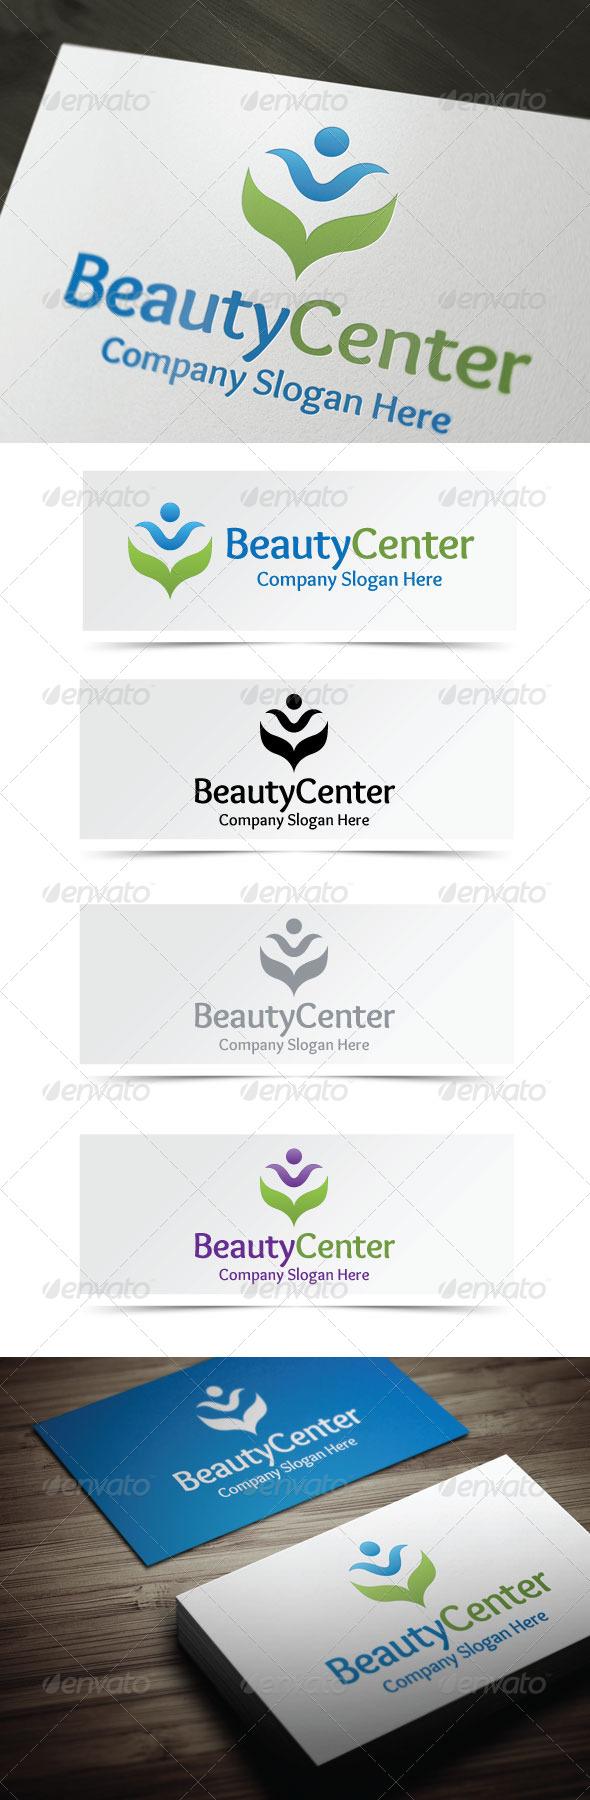 GraphicRiver Beauty Center 4105969